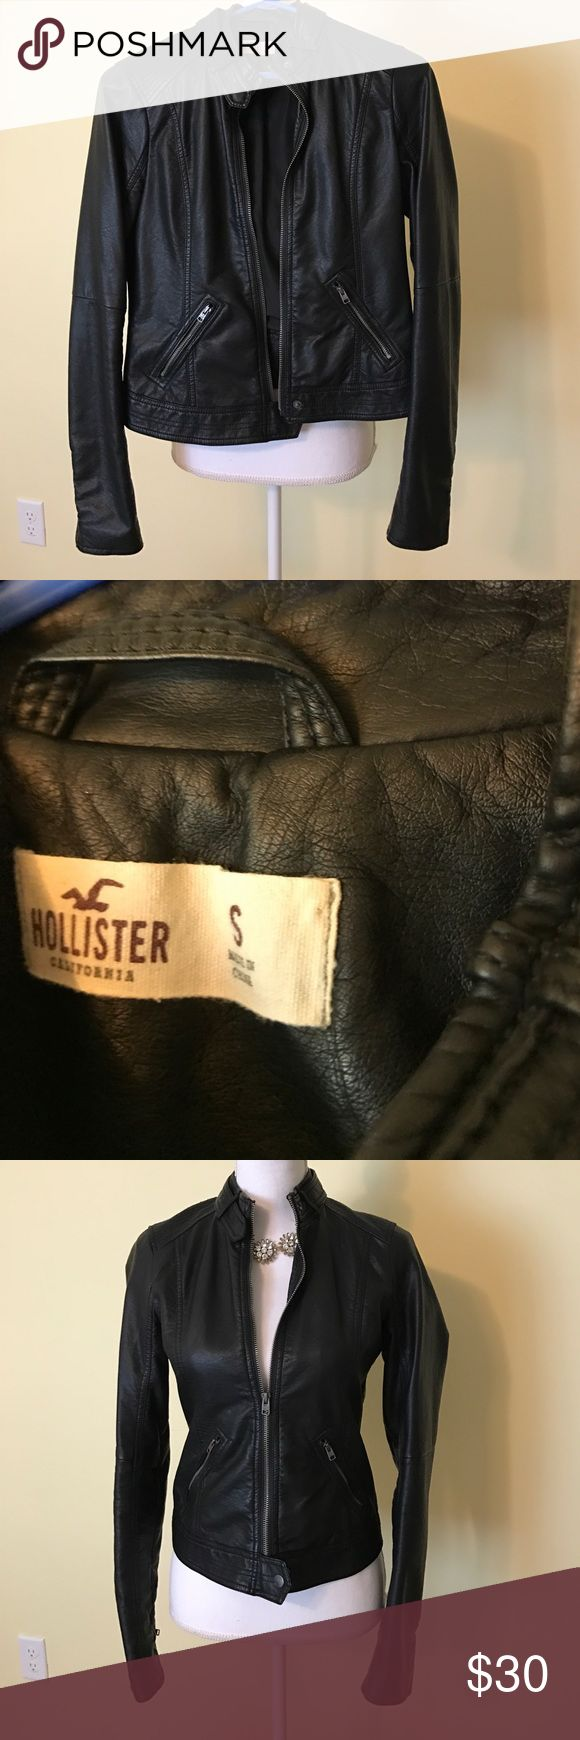 Hollister jacket Black leather jacket with lining Hollister Jackets & Coats